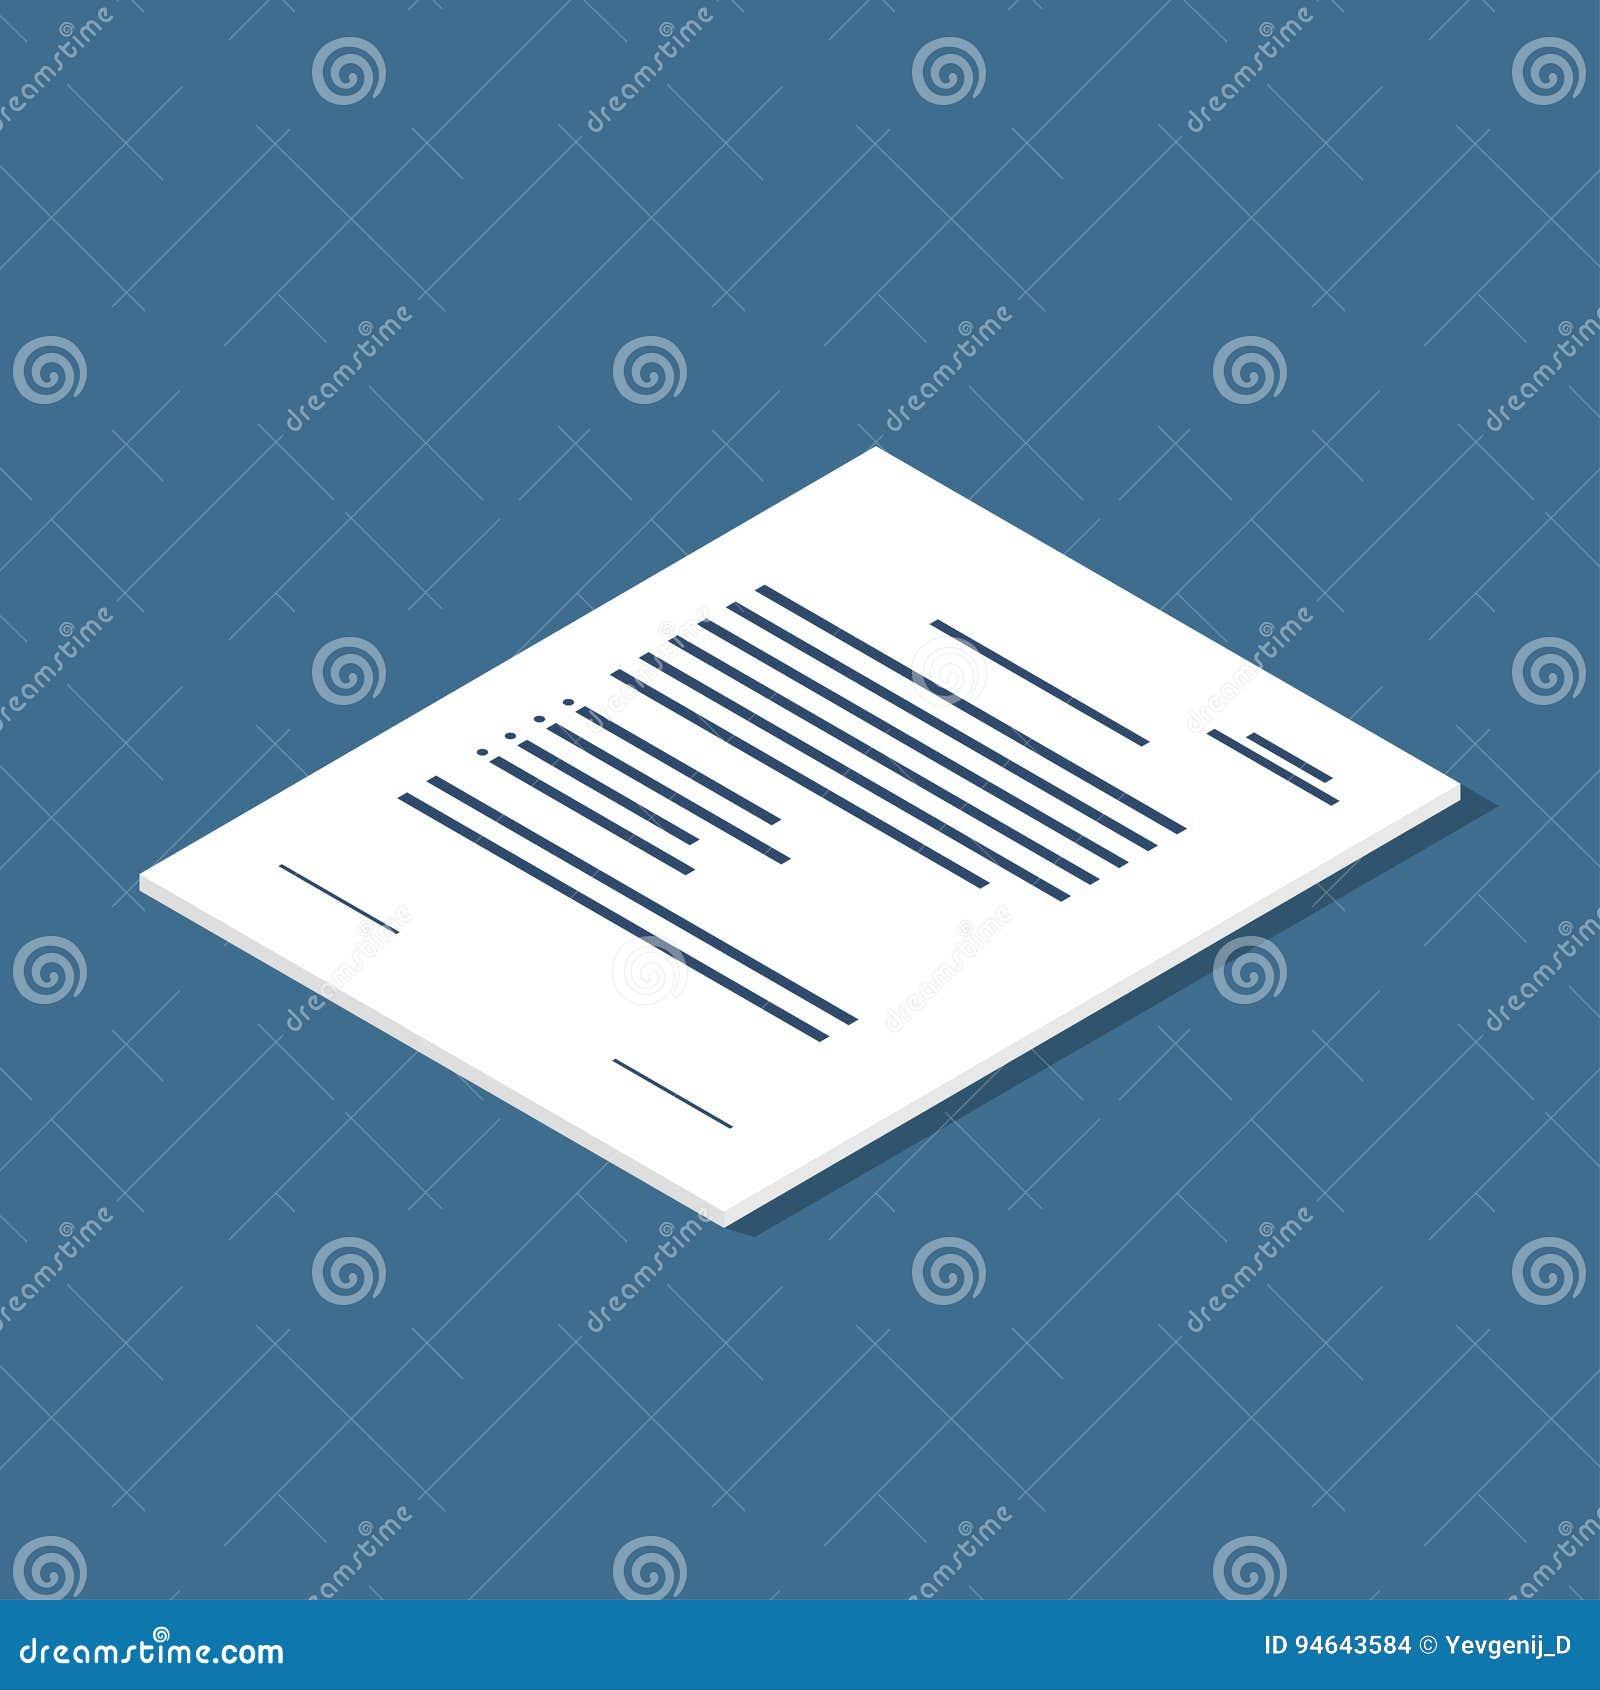 Icono De Documento Isométrico Acuerdo, Símbolo Del Contrato ...